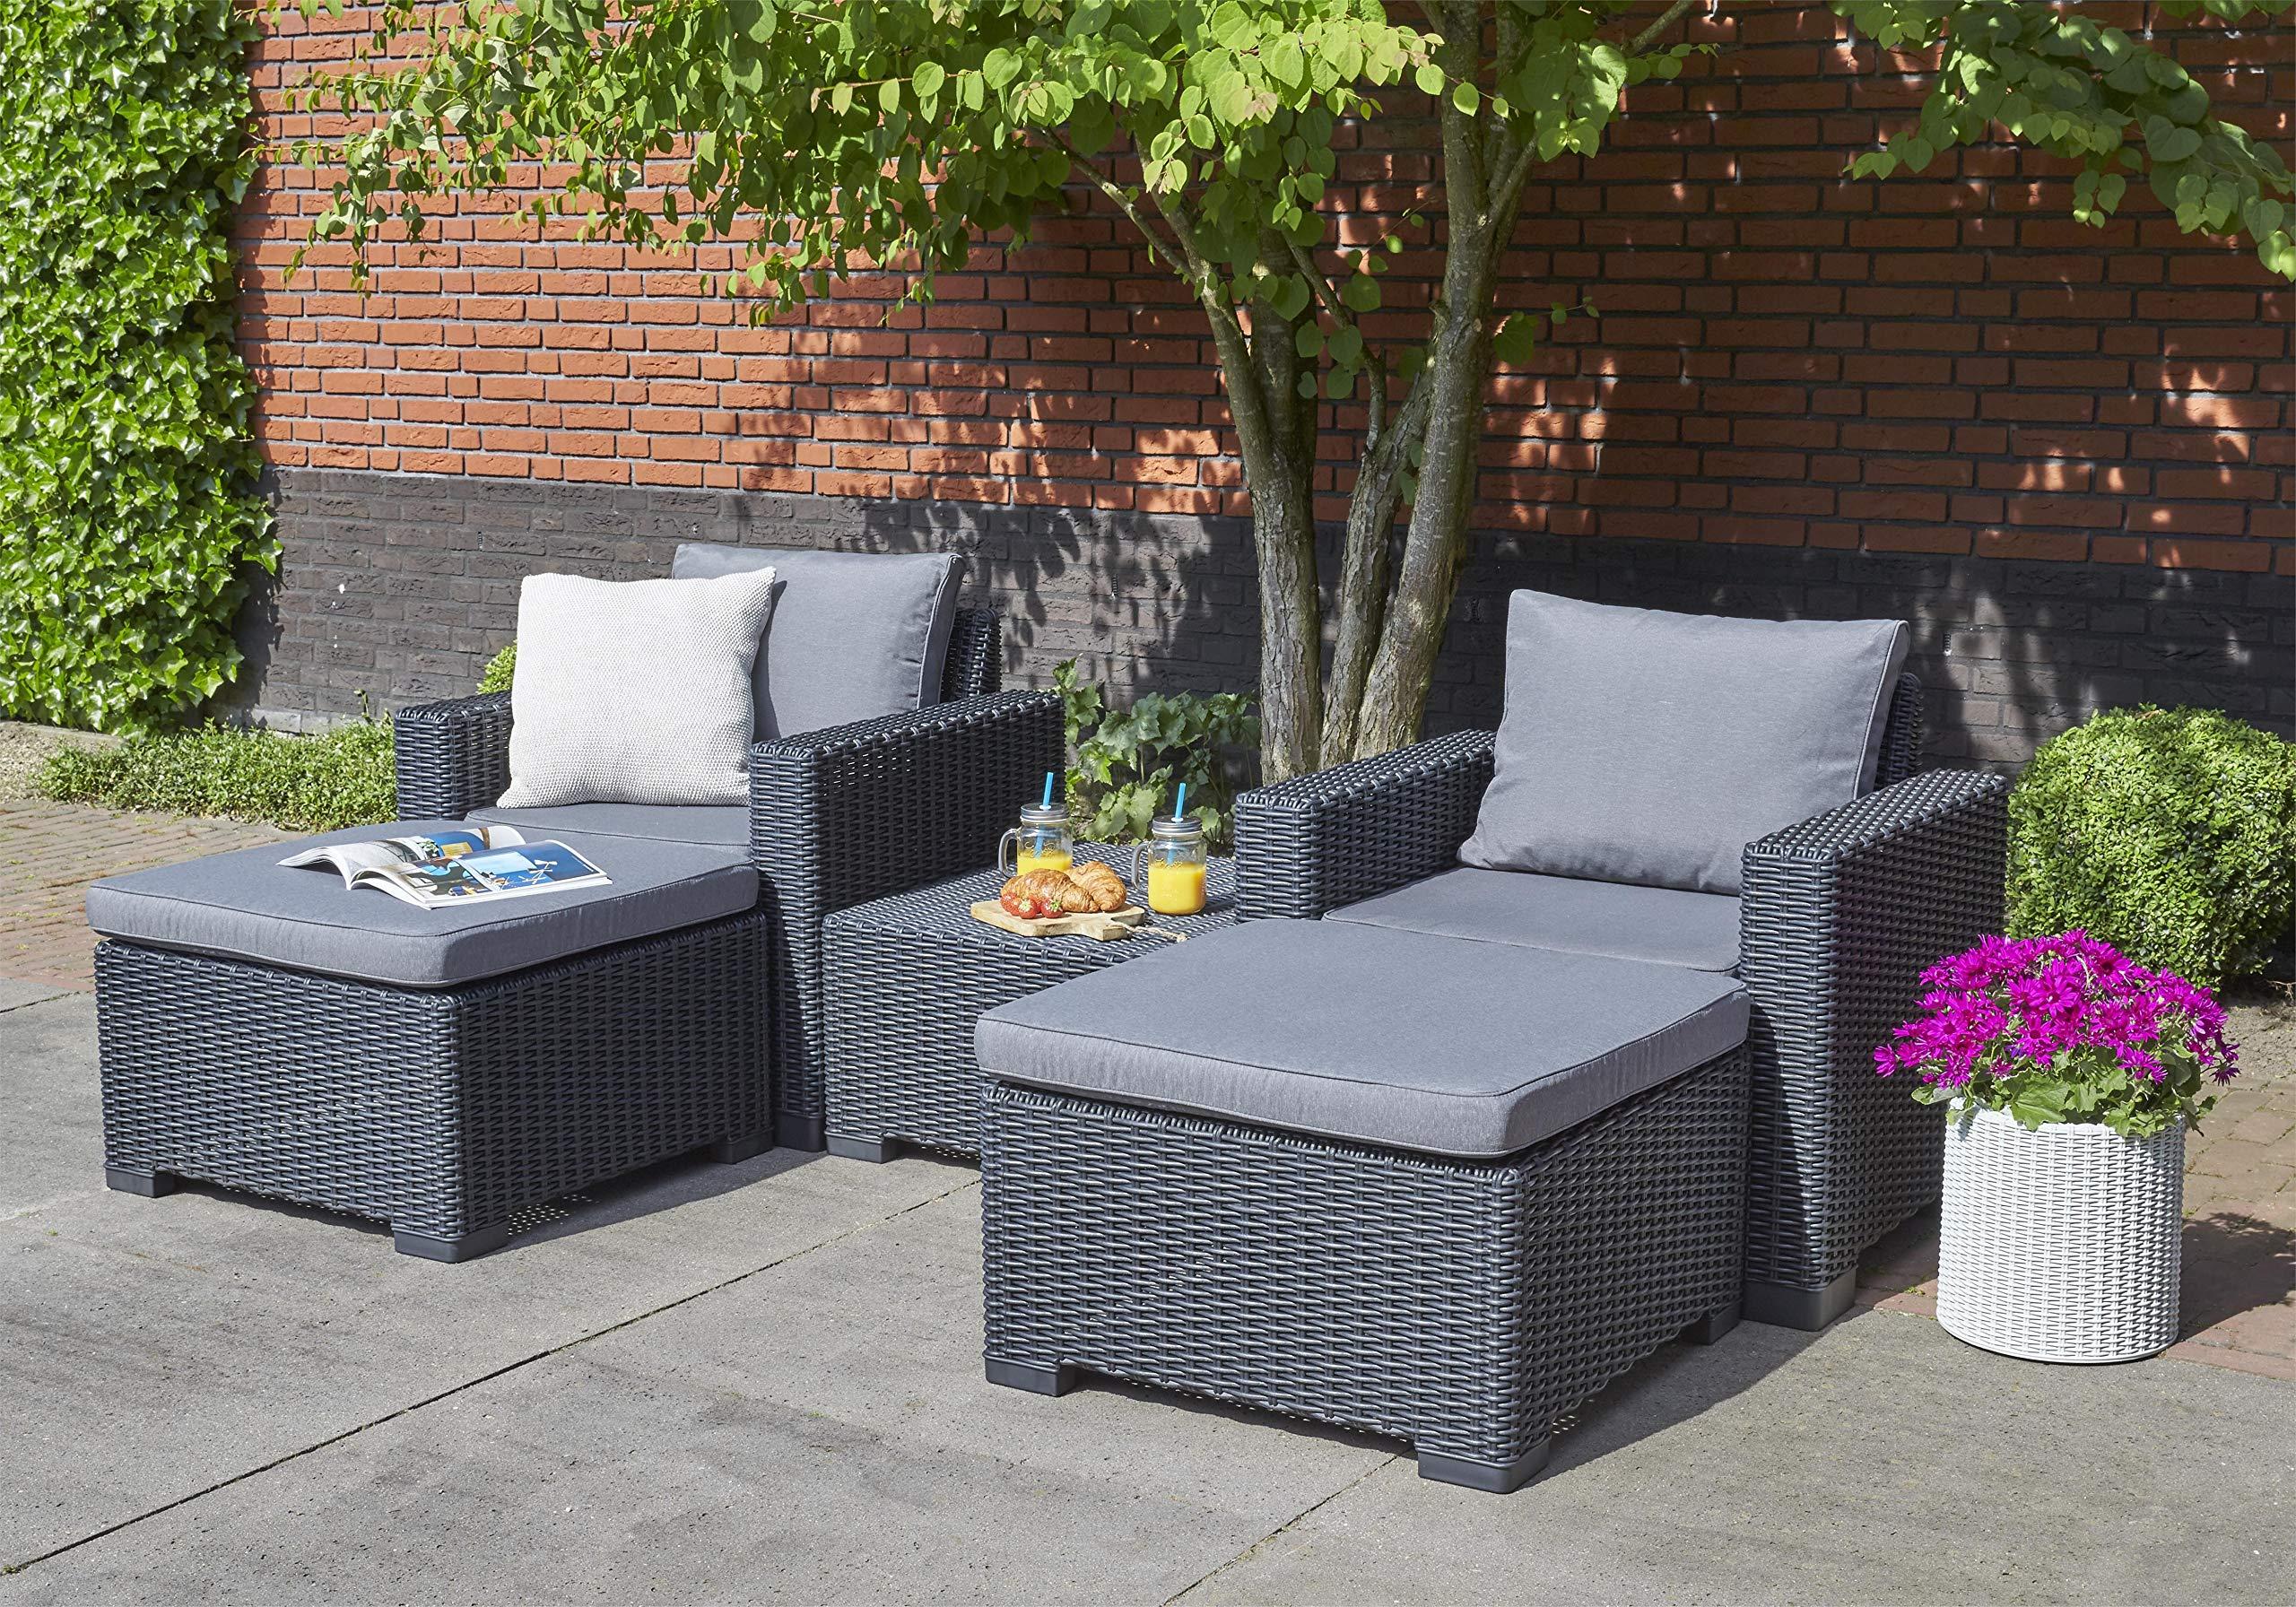 Allibert by Keter California Rattan Outdoor Coffee Table Garden Furniture – Cappuccino